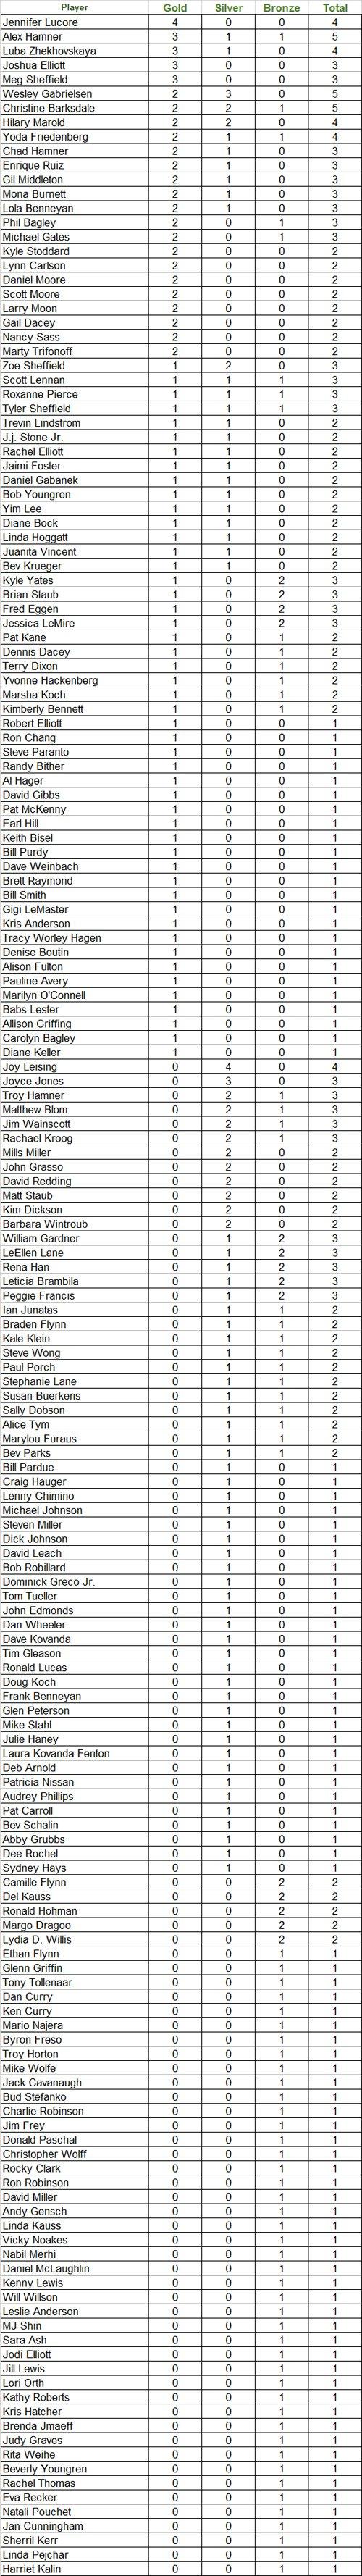 2014 Pickleball Nationals Medal Count